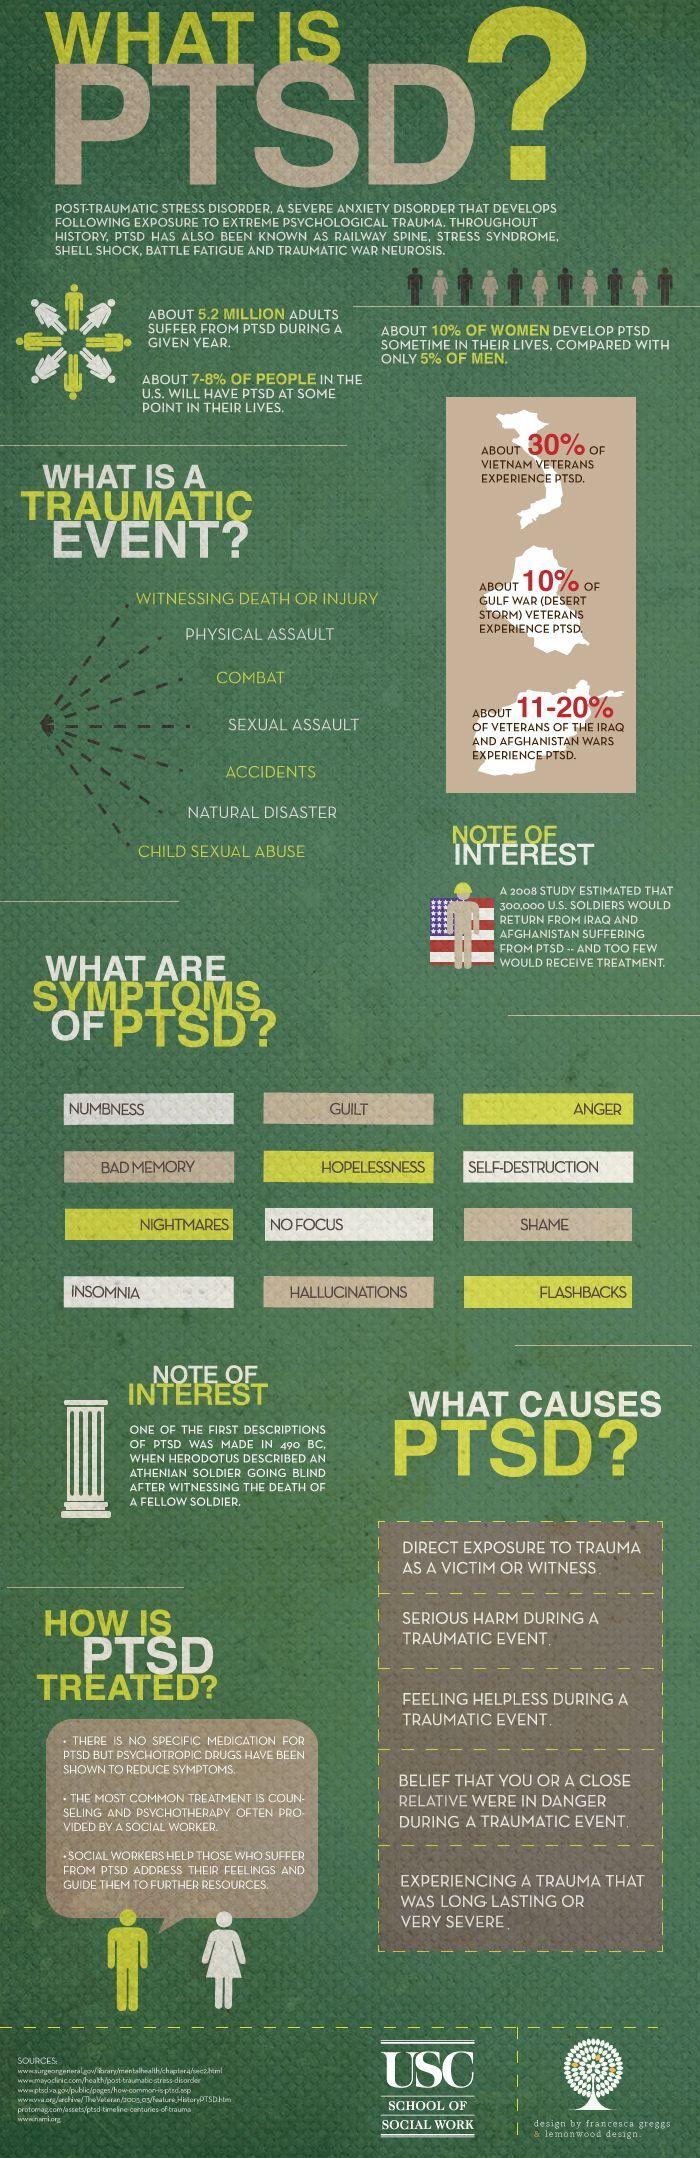 PTSD Awareness Infographic pinned via USC School of Social Work - msw.usc.edu